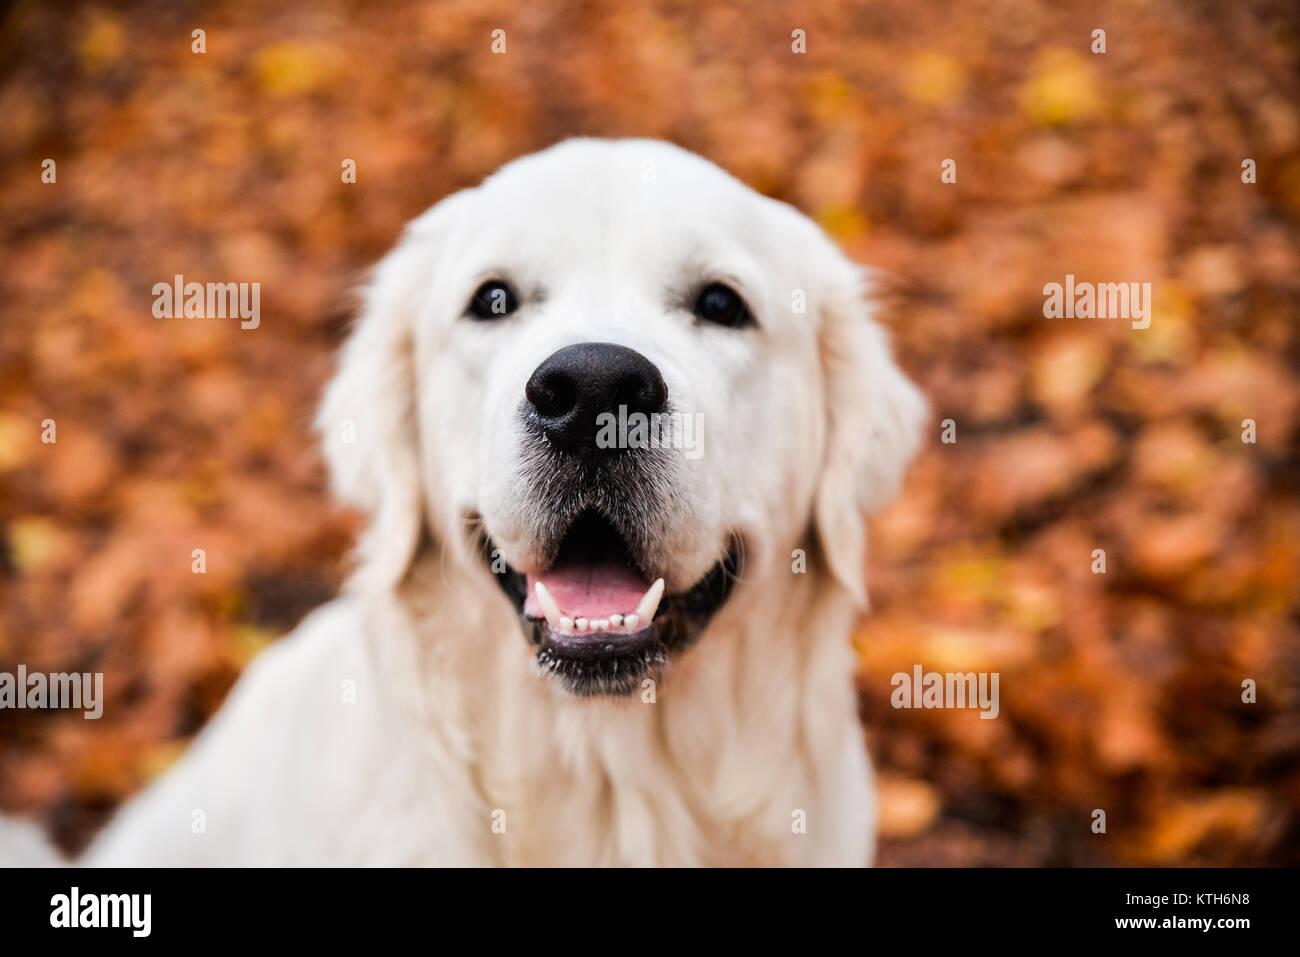 Golden Retriever Gentle Expression Portrait Nose Focused Stock